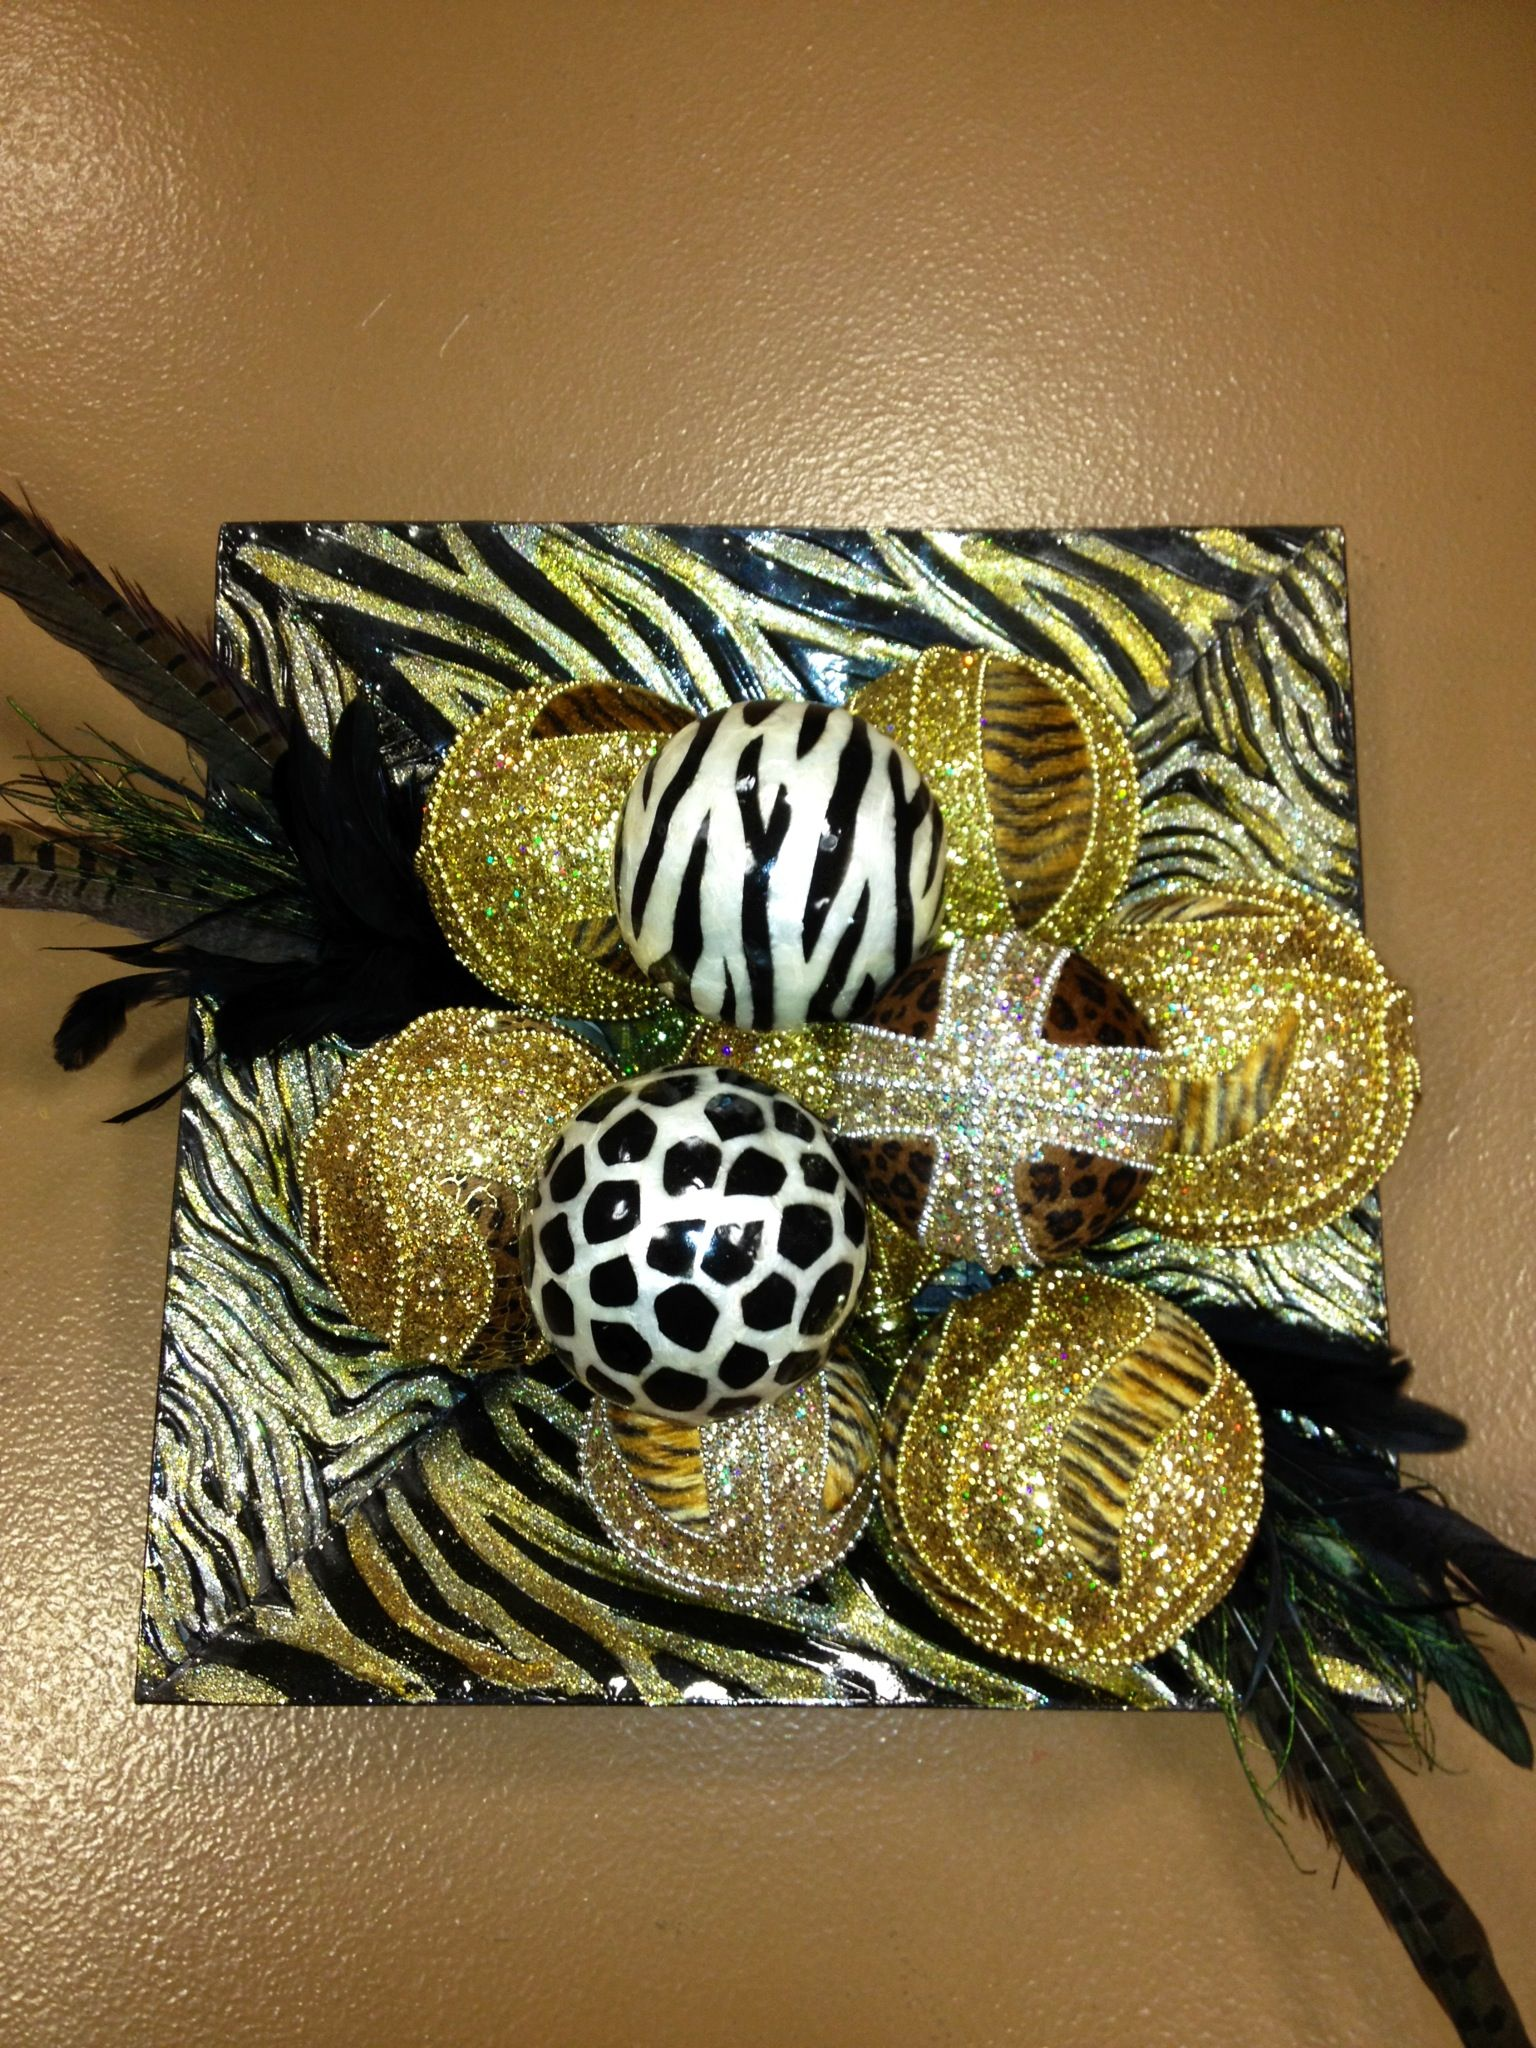 Decorative balls with safari glass square plate. (With